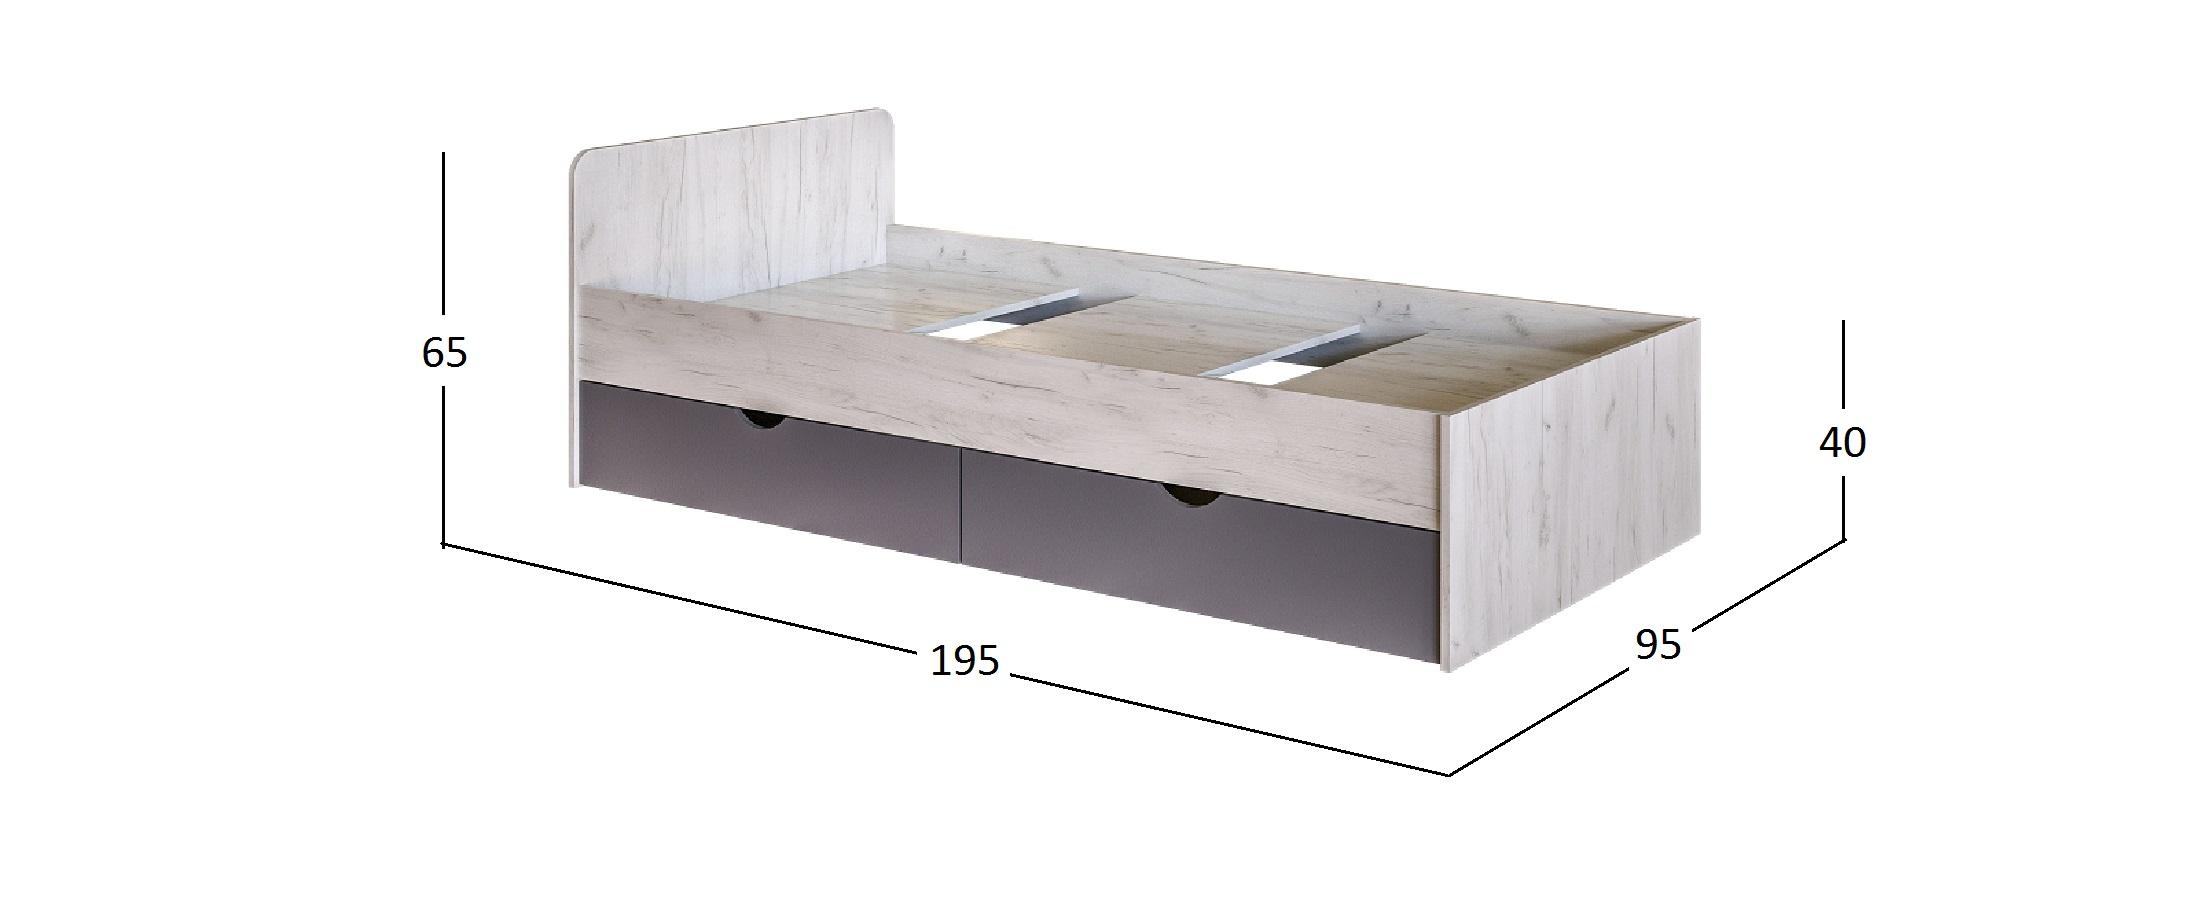 Кровать 900х1900 Крафт c настилом Модель 502